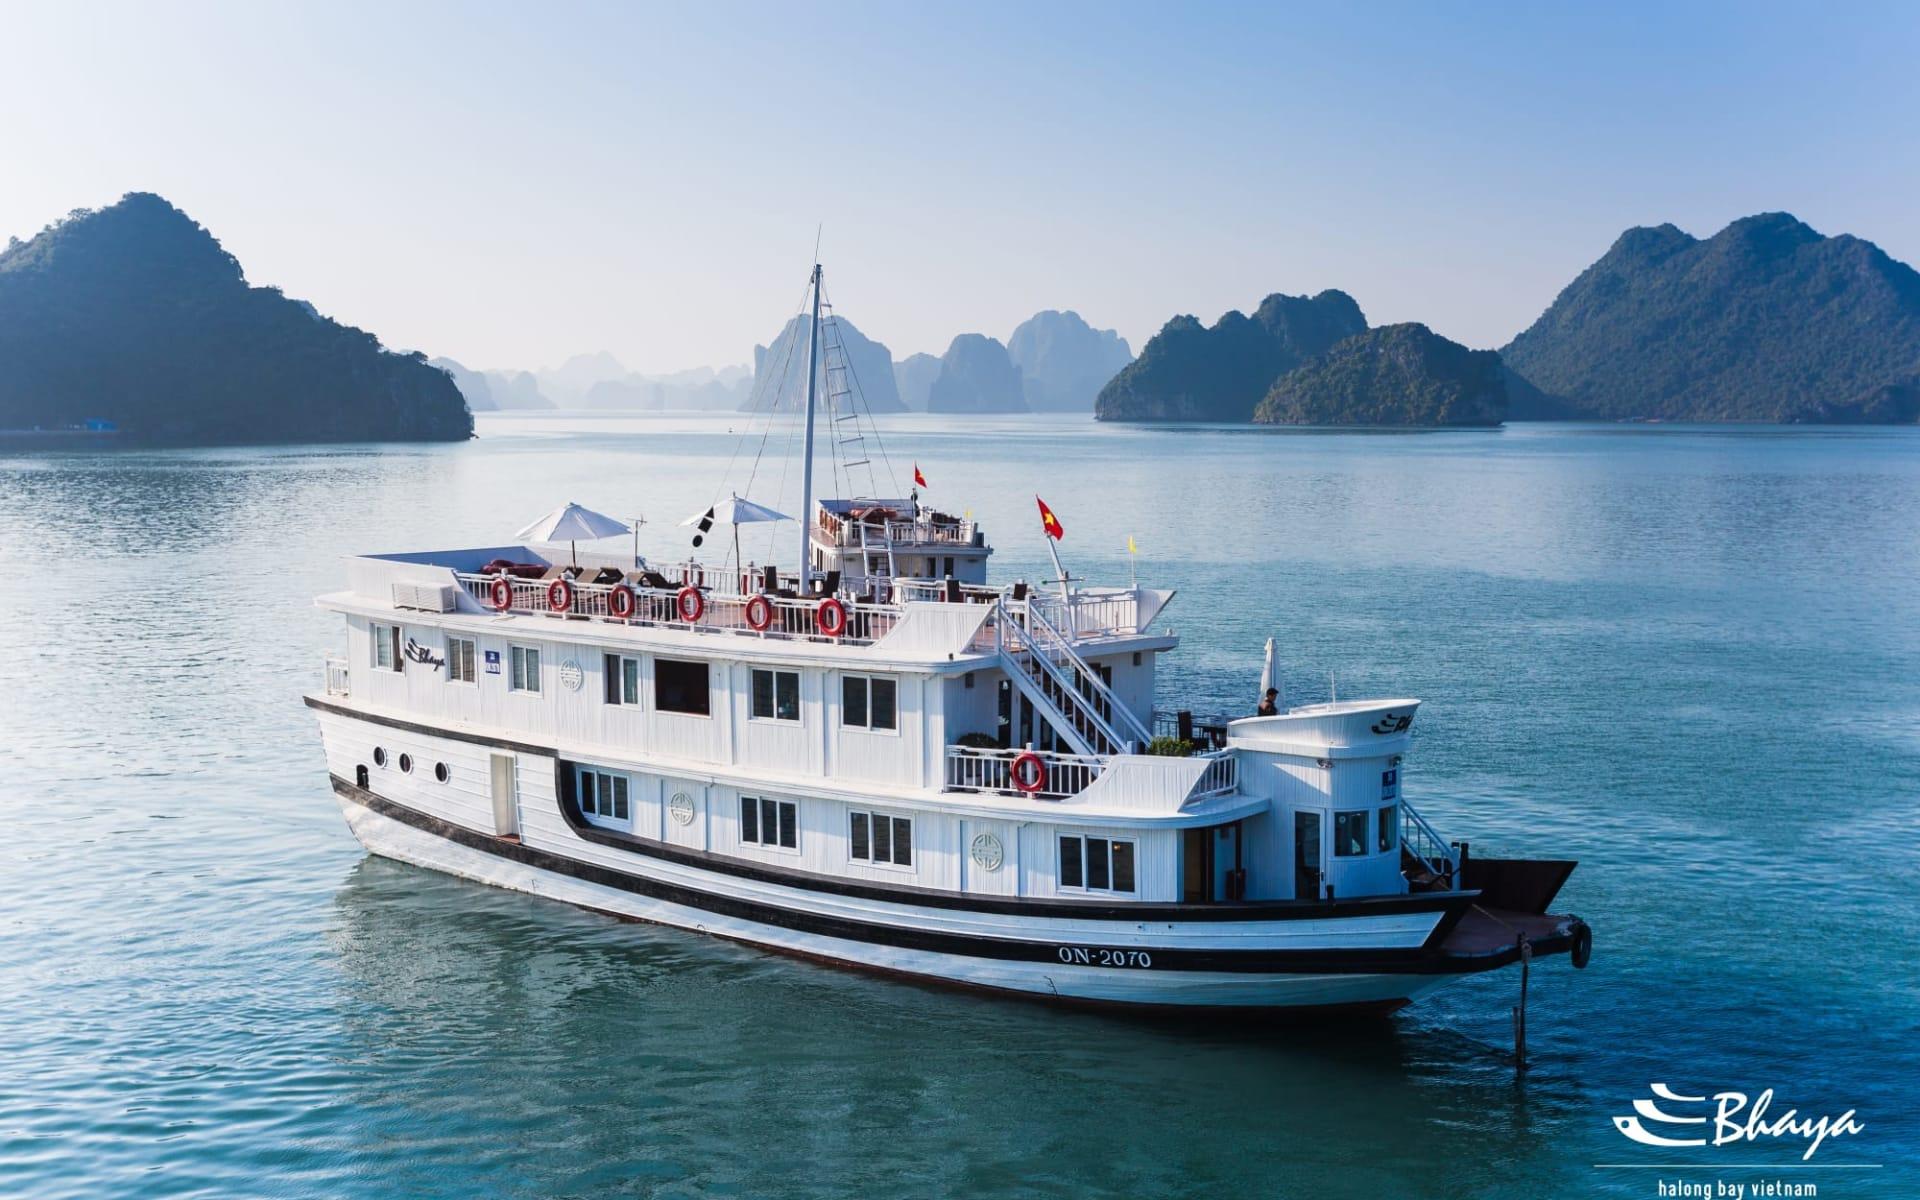 Halong Bucht Kreuzfahrten mit «Bhaya Premium» ab Hanoi: Bhaya-Classic-Premium-Overview (2)